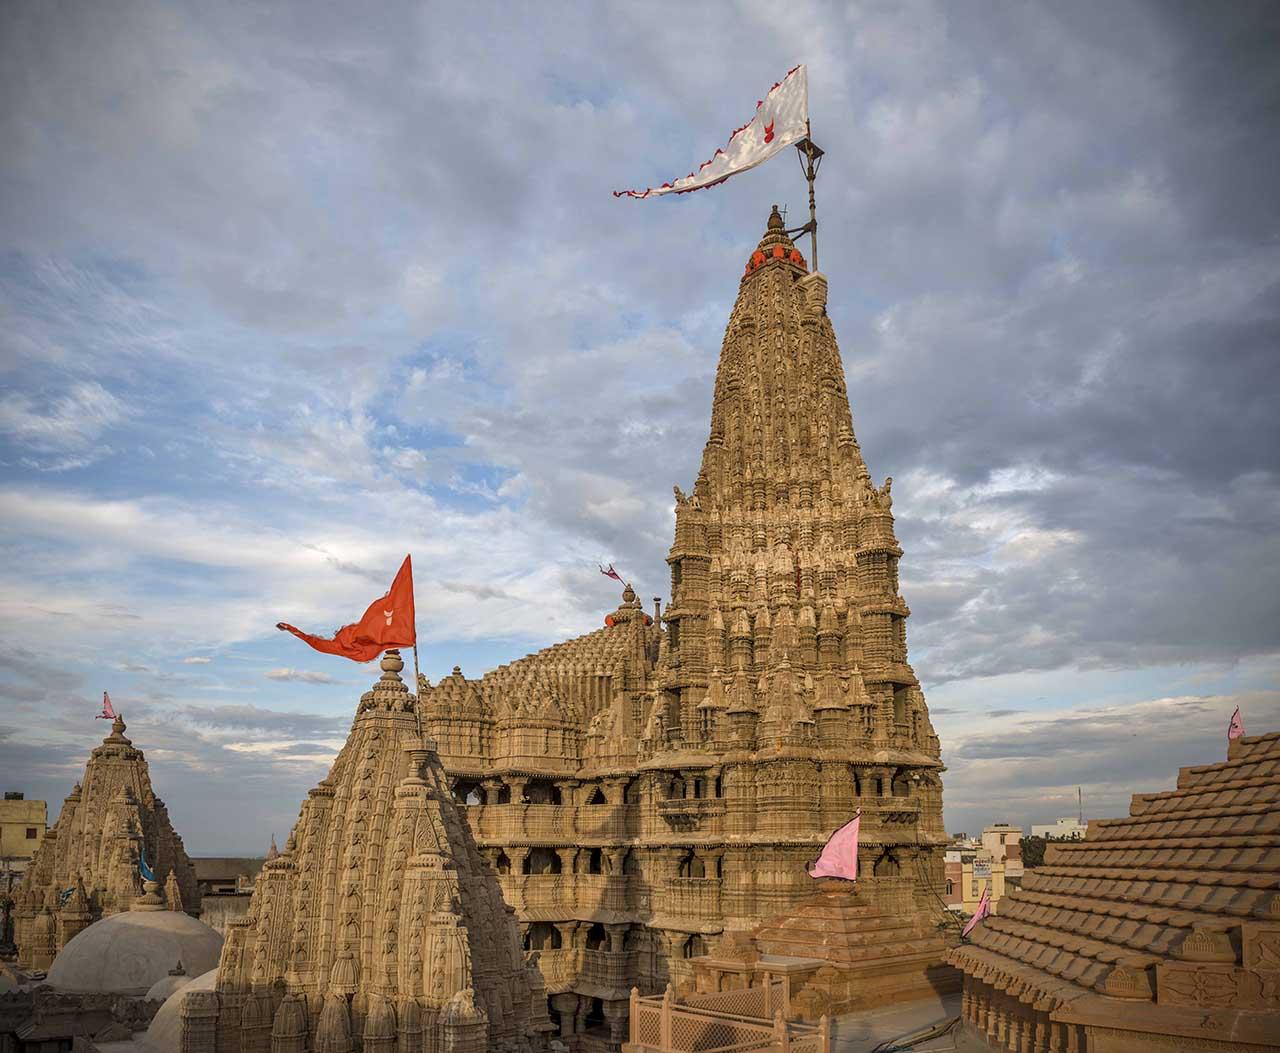 Temples of India - Dwarakadhish Temple, Gujarat